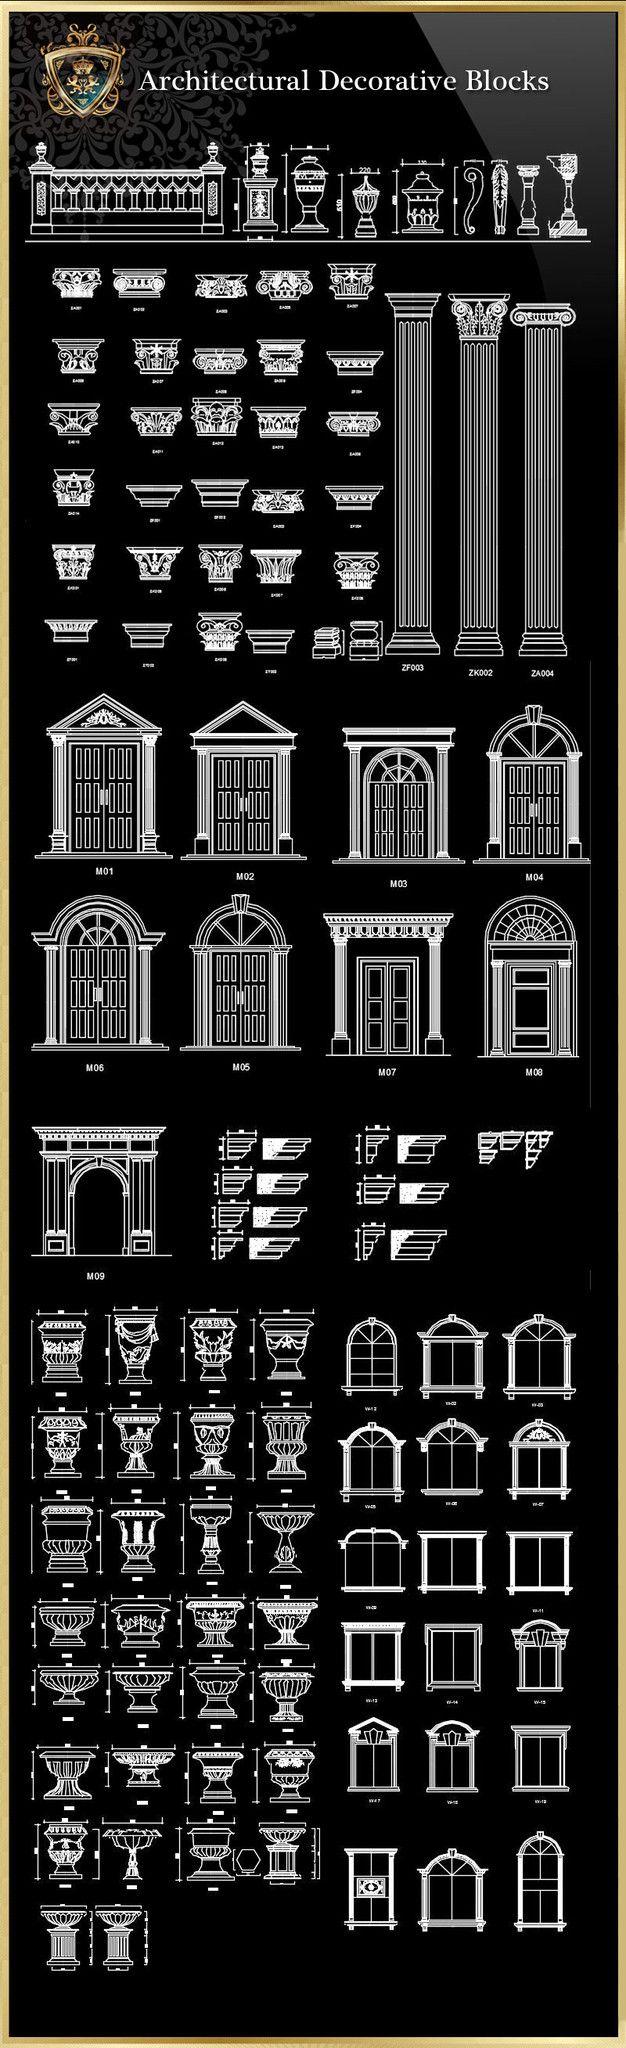 Royal Architecture Decorative Blocks – CAD Design | Free CAD Blocks,Drawings,Details